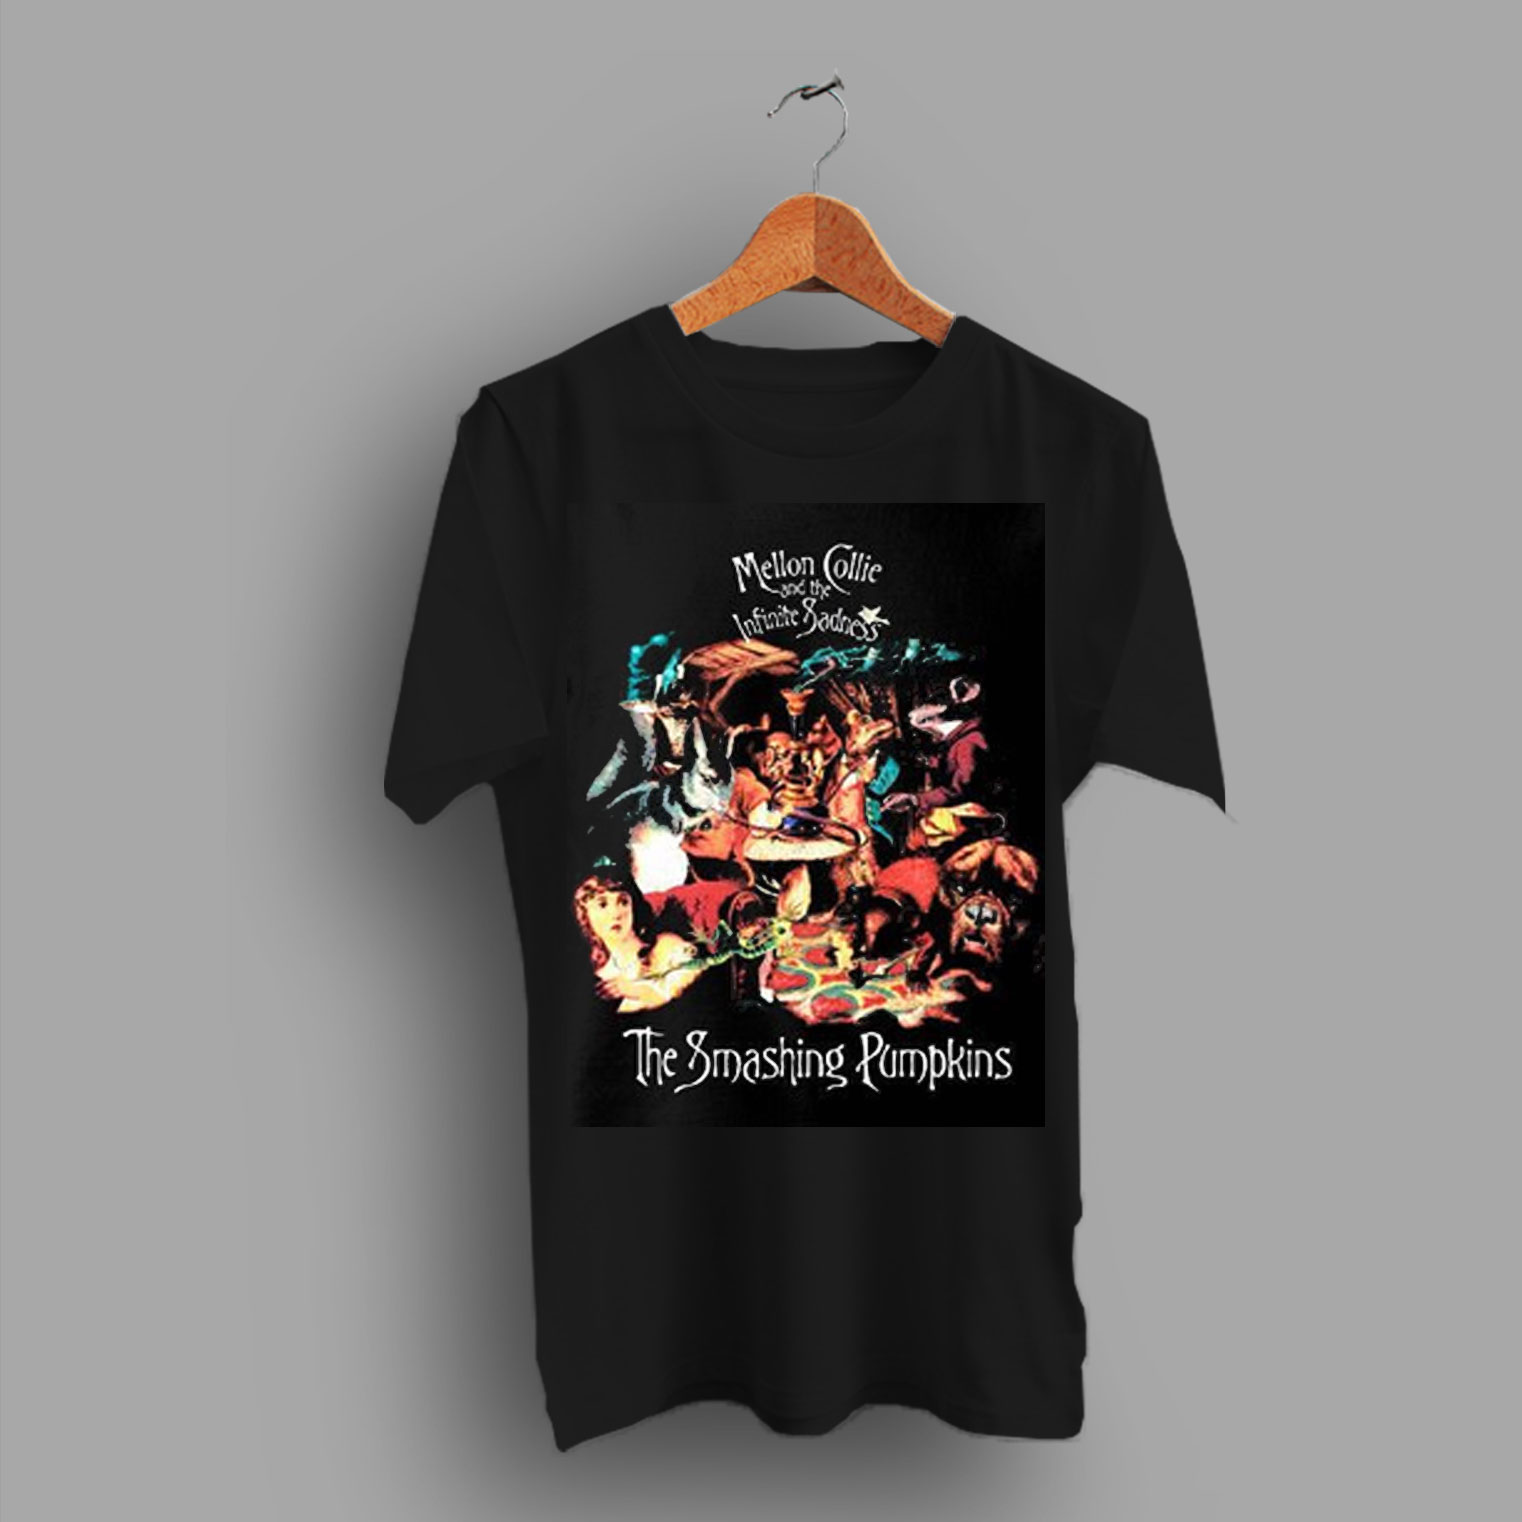 Mellon Collie T-Shirt The Smashing Pumpkins